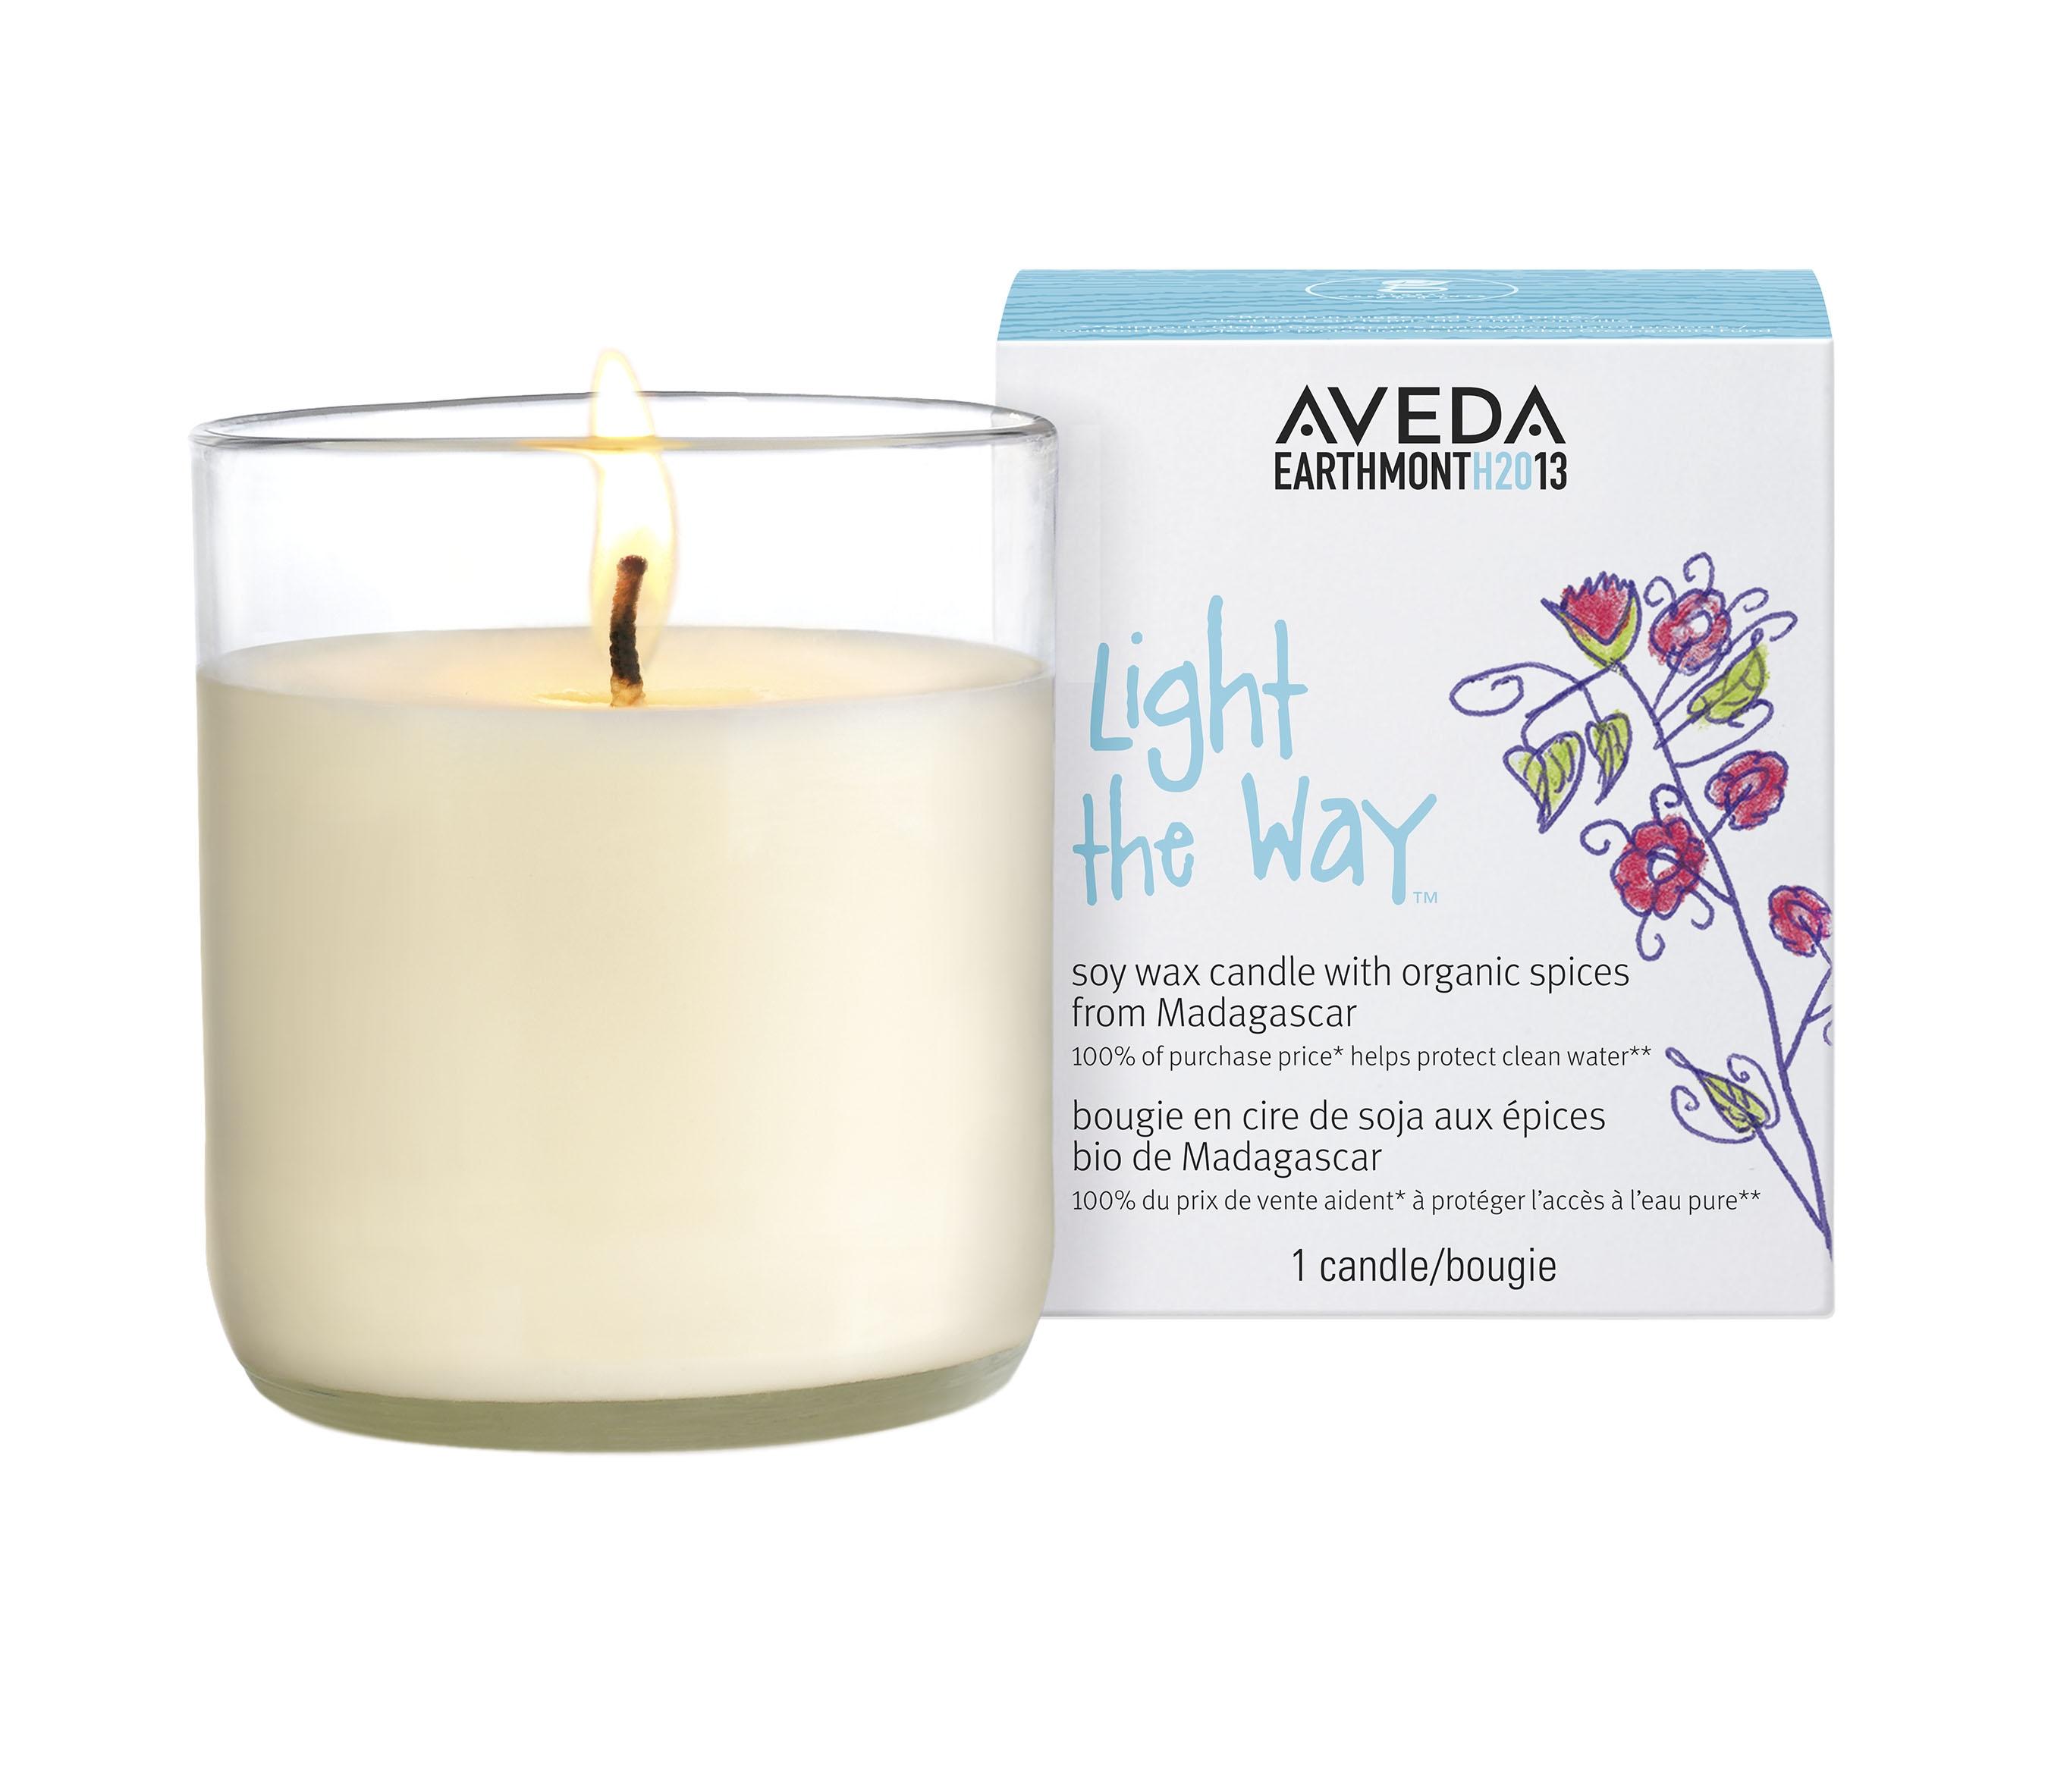 Candela Light the way